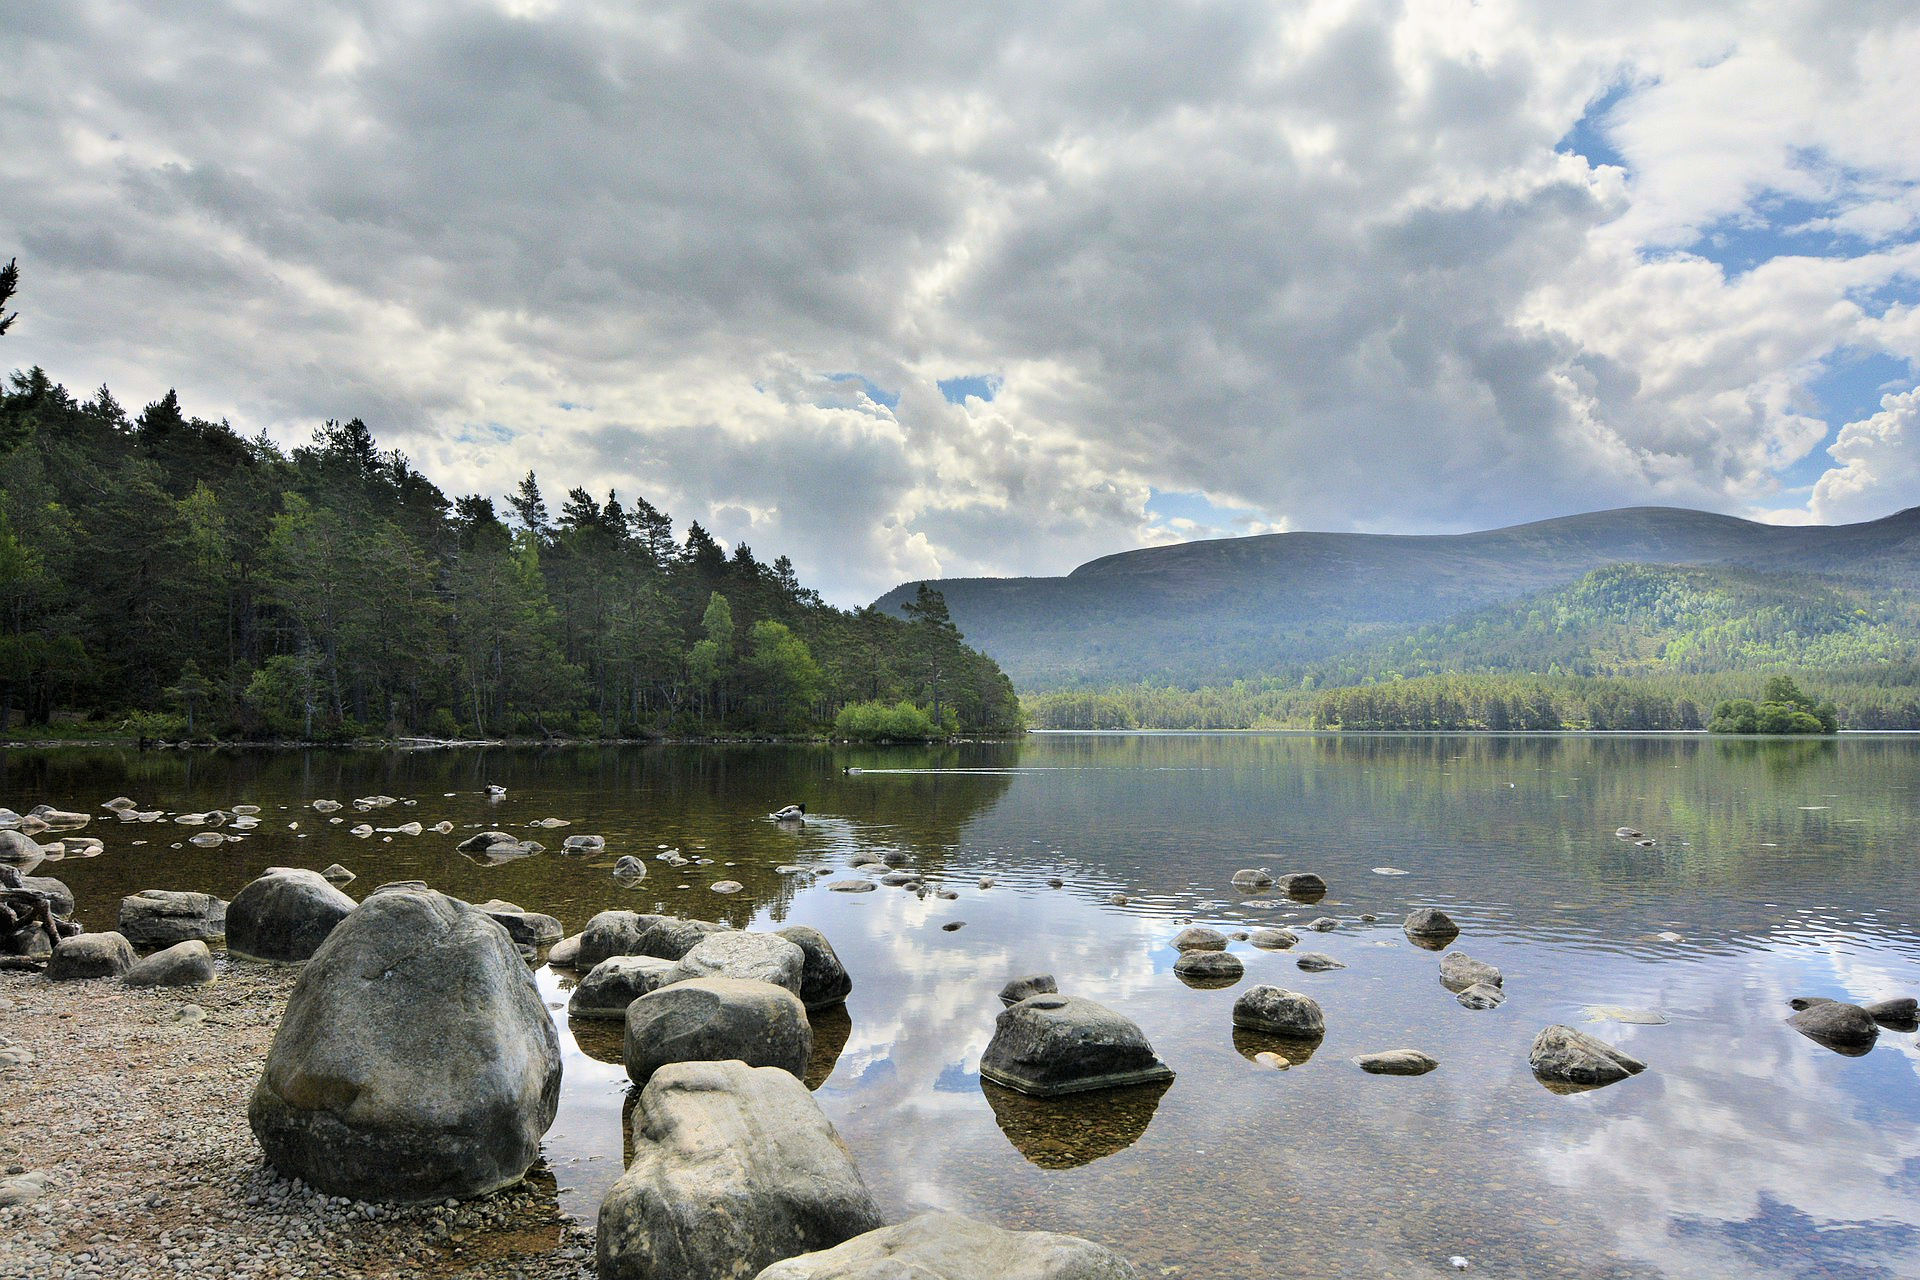 Highlands of Scotland - the stunning Cairngorms